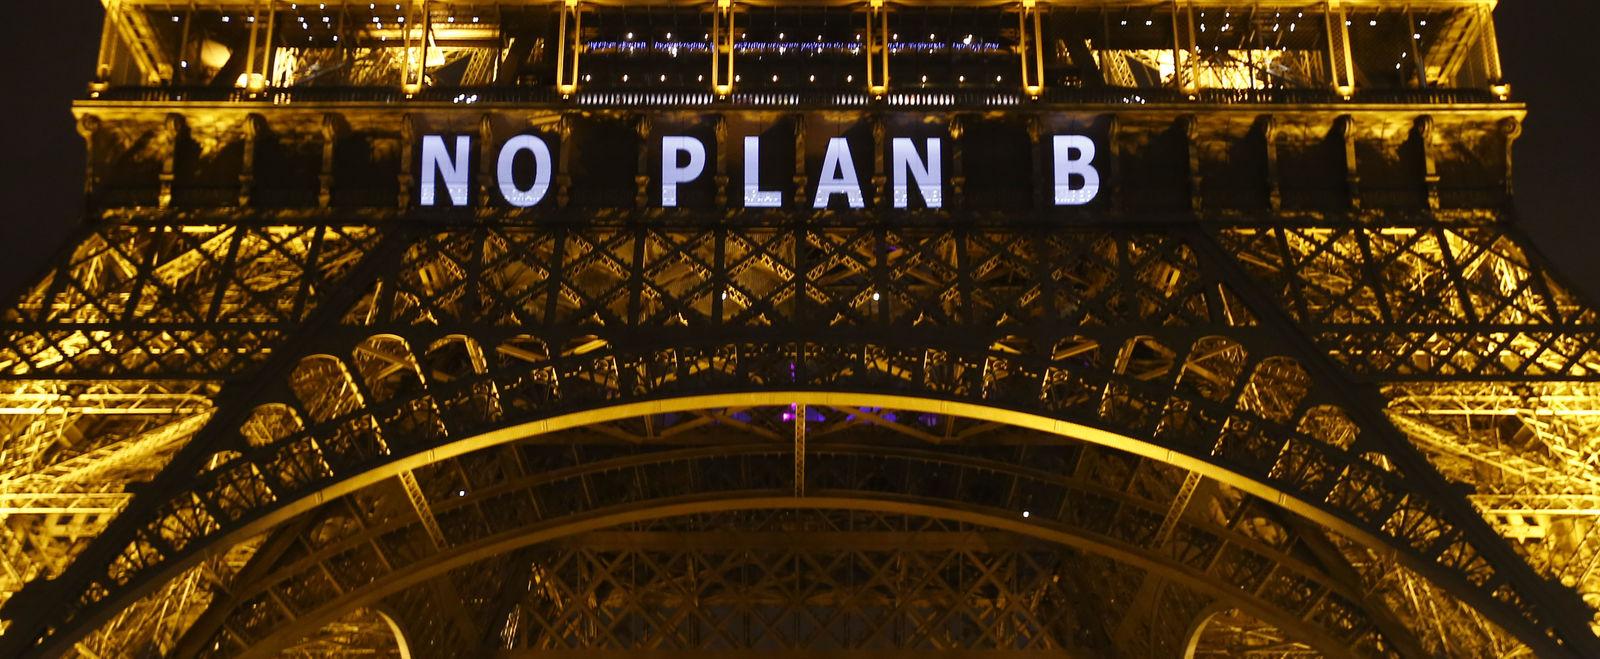 Eiffel Tower No Plan B